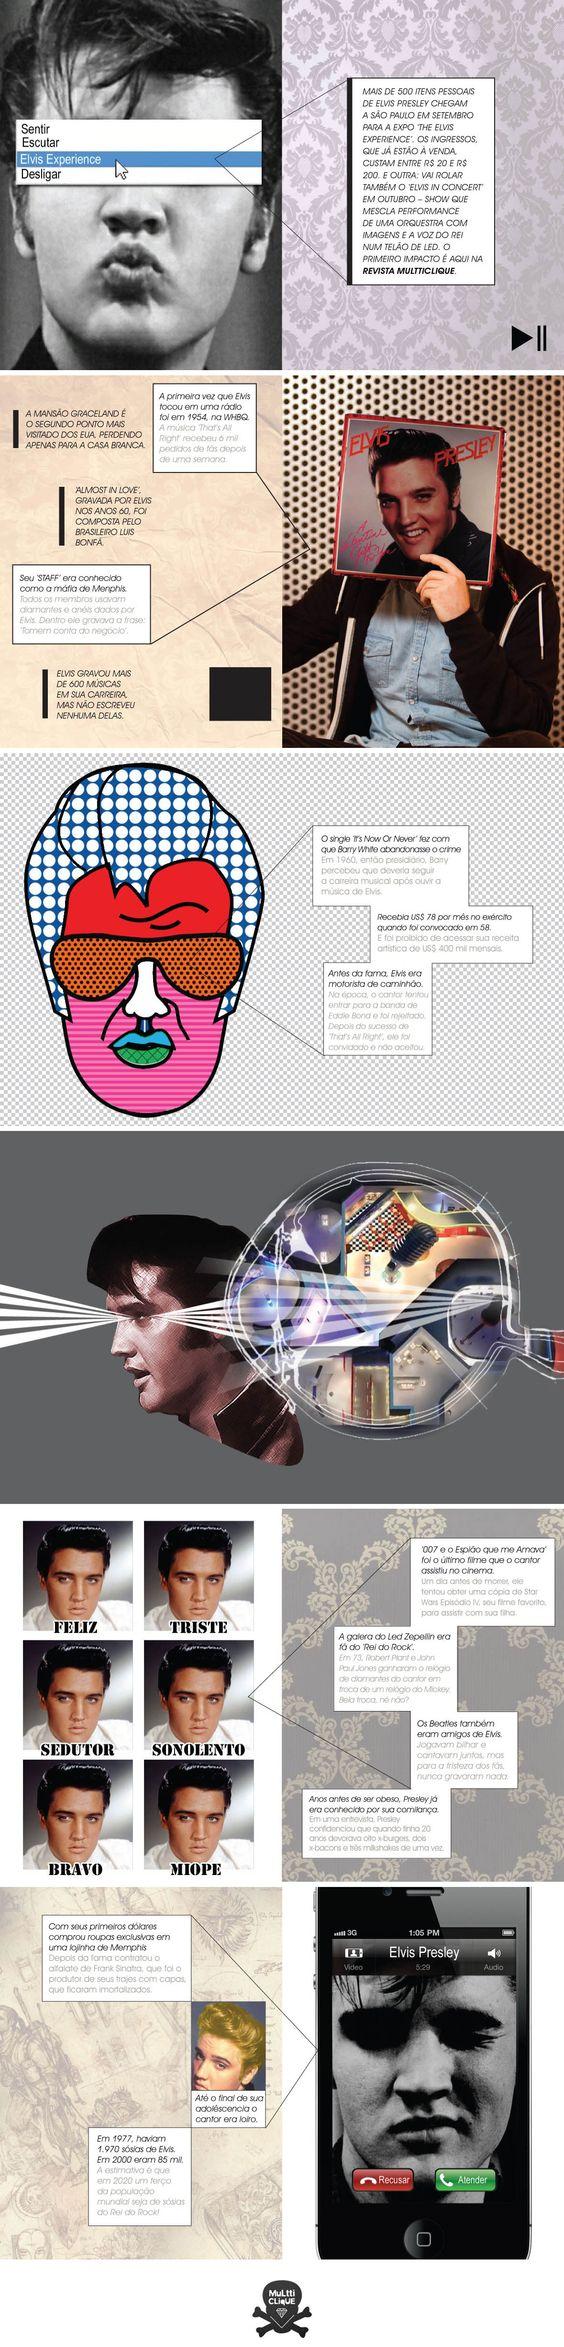 The Elvis Expirience